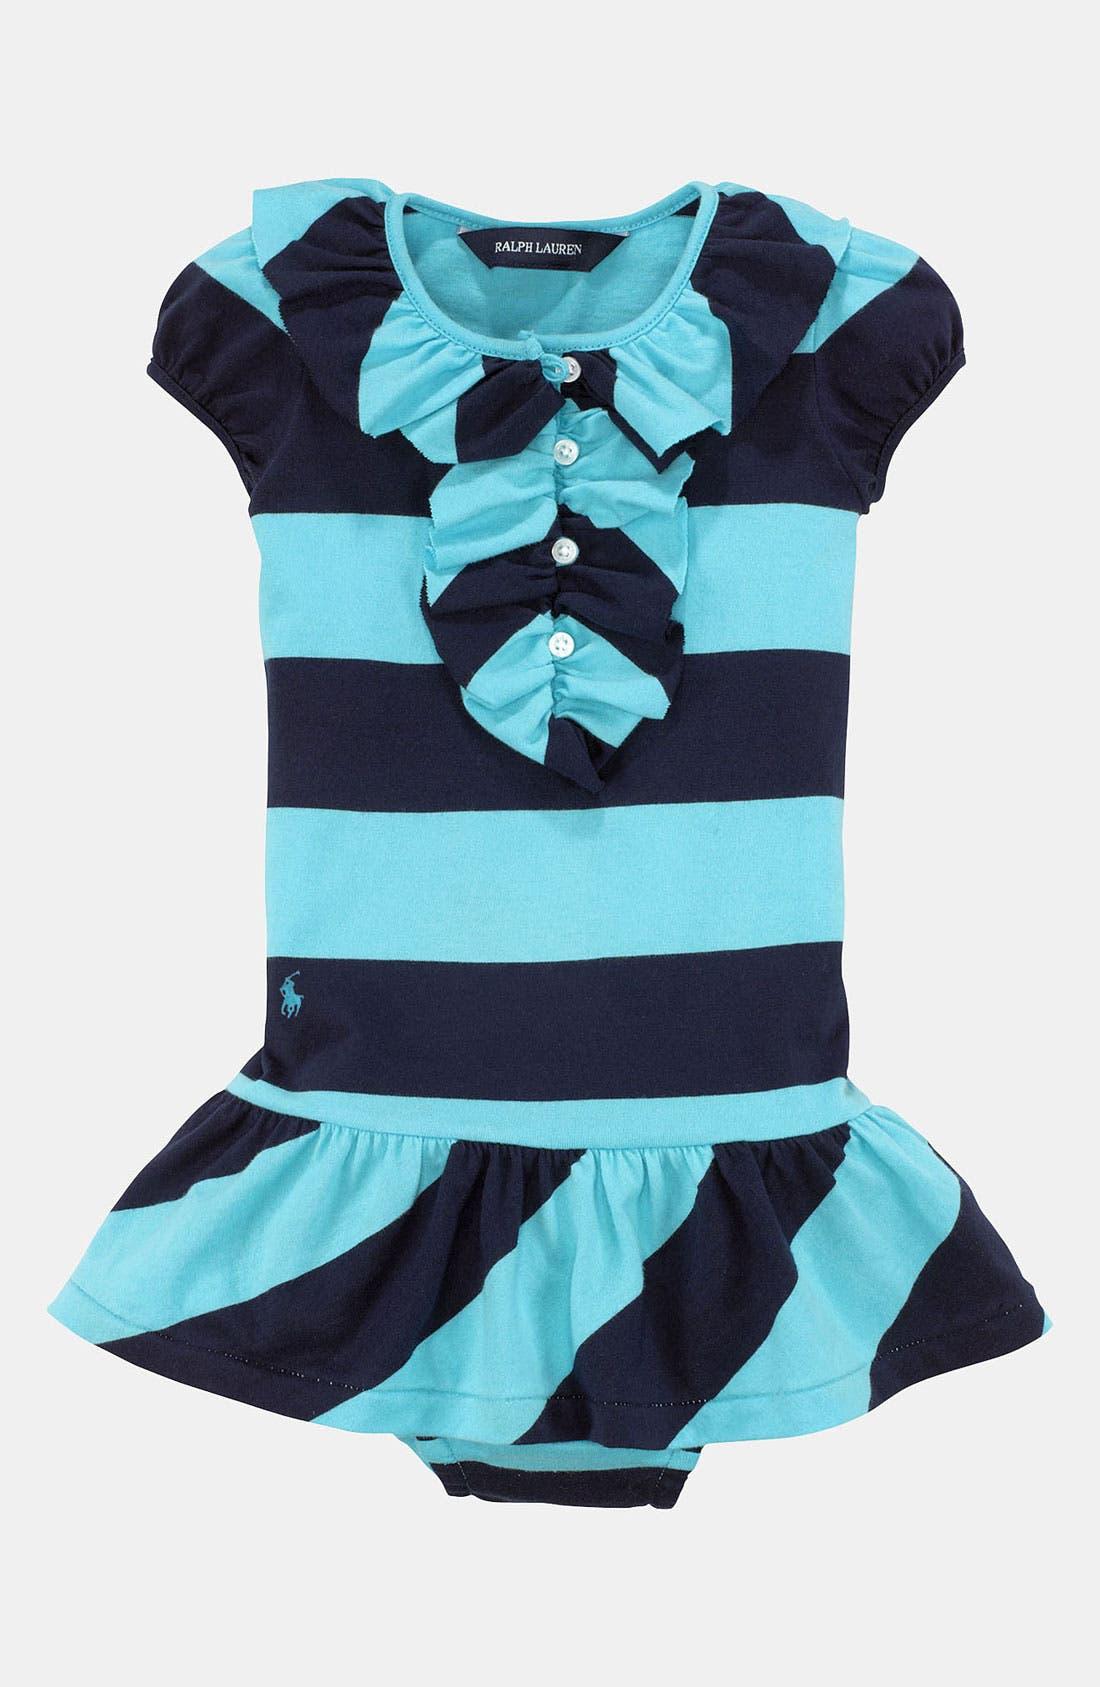 Alternate Image 1 Selected - Ralph Lauren Stripe Dress & Bloomers (Infant)